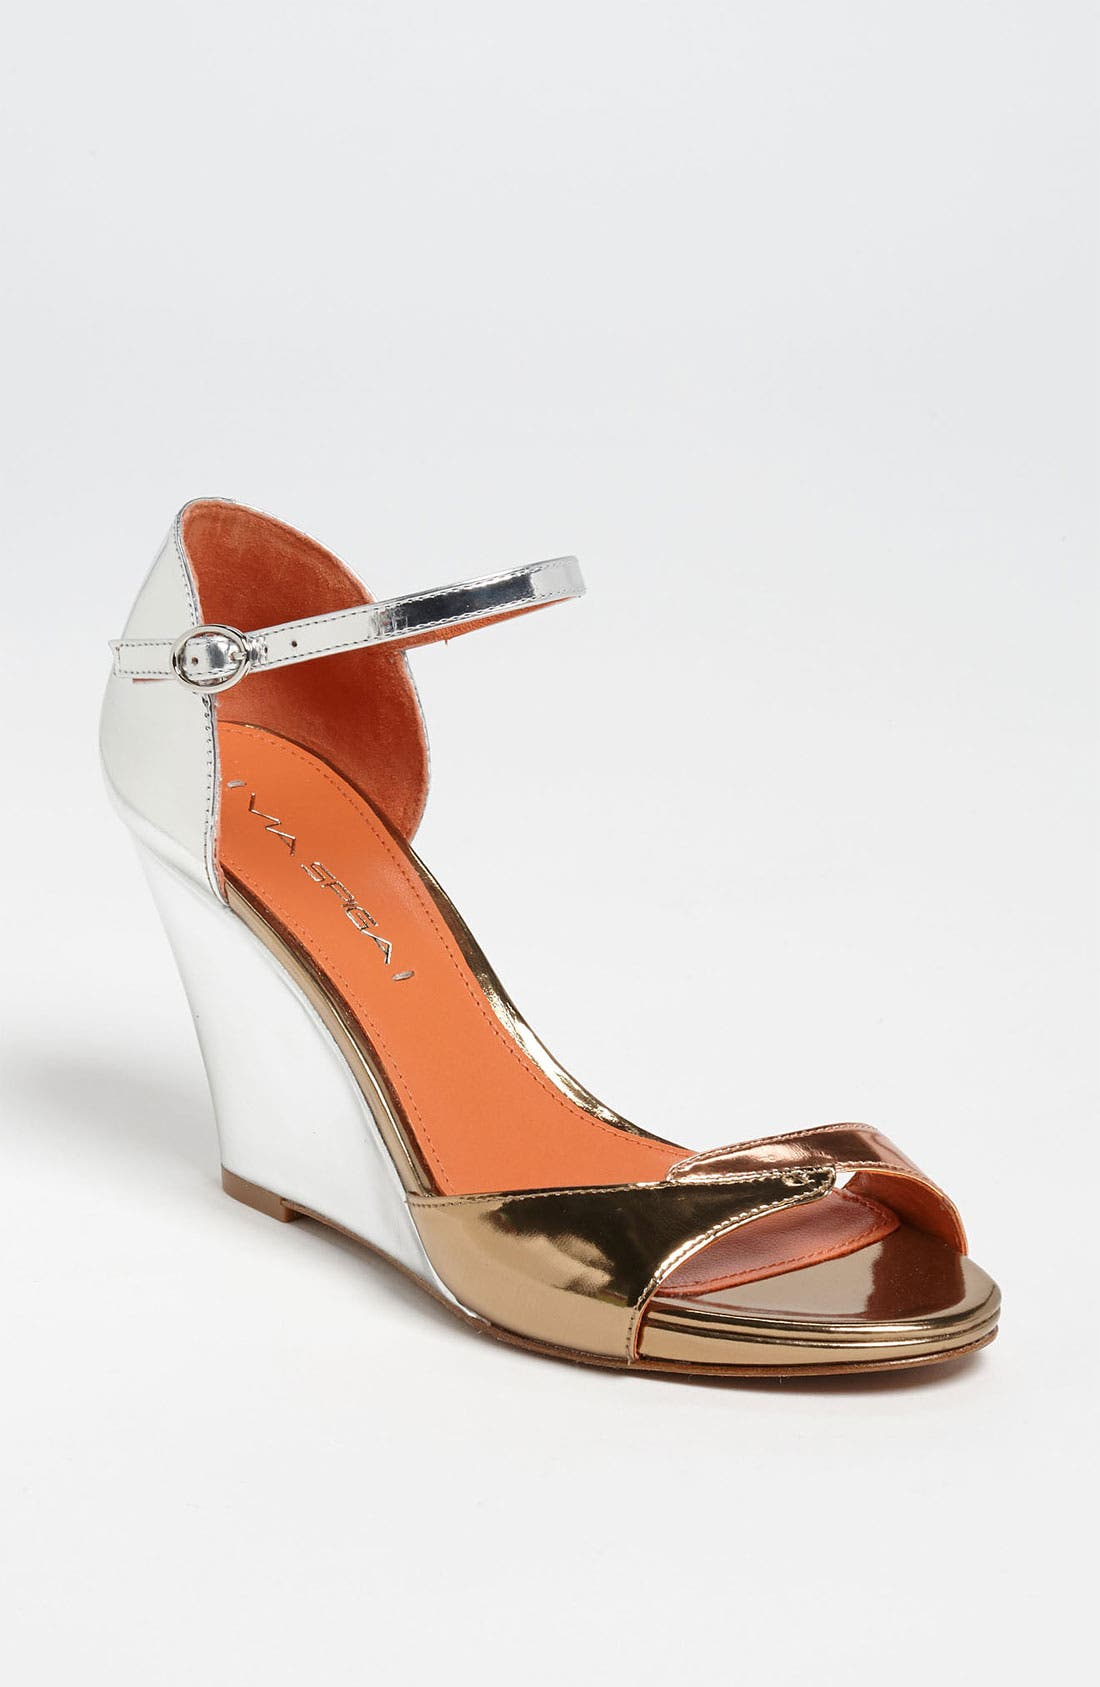 Alternate Image 1 Selected - Via Spiga 'Danice' Wedge Sandal